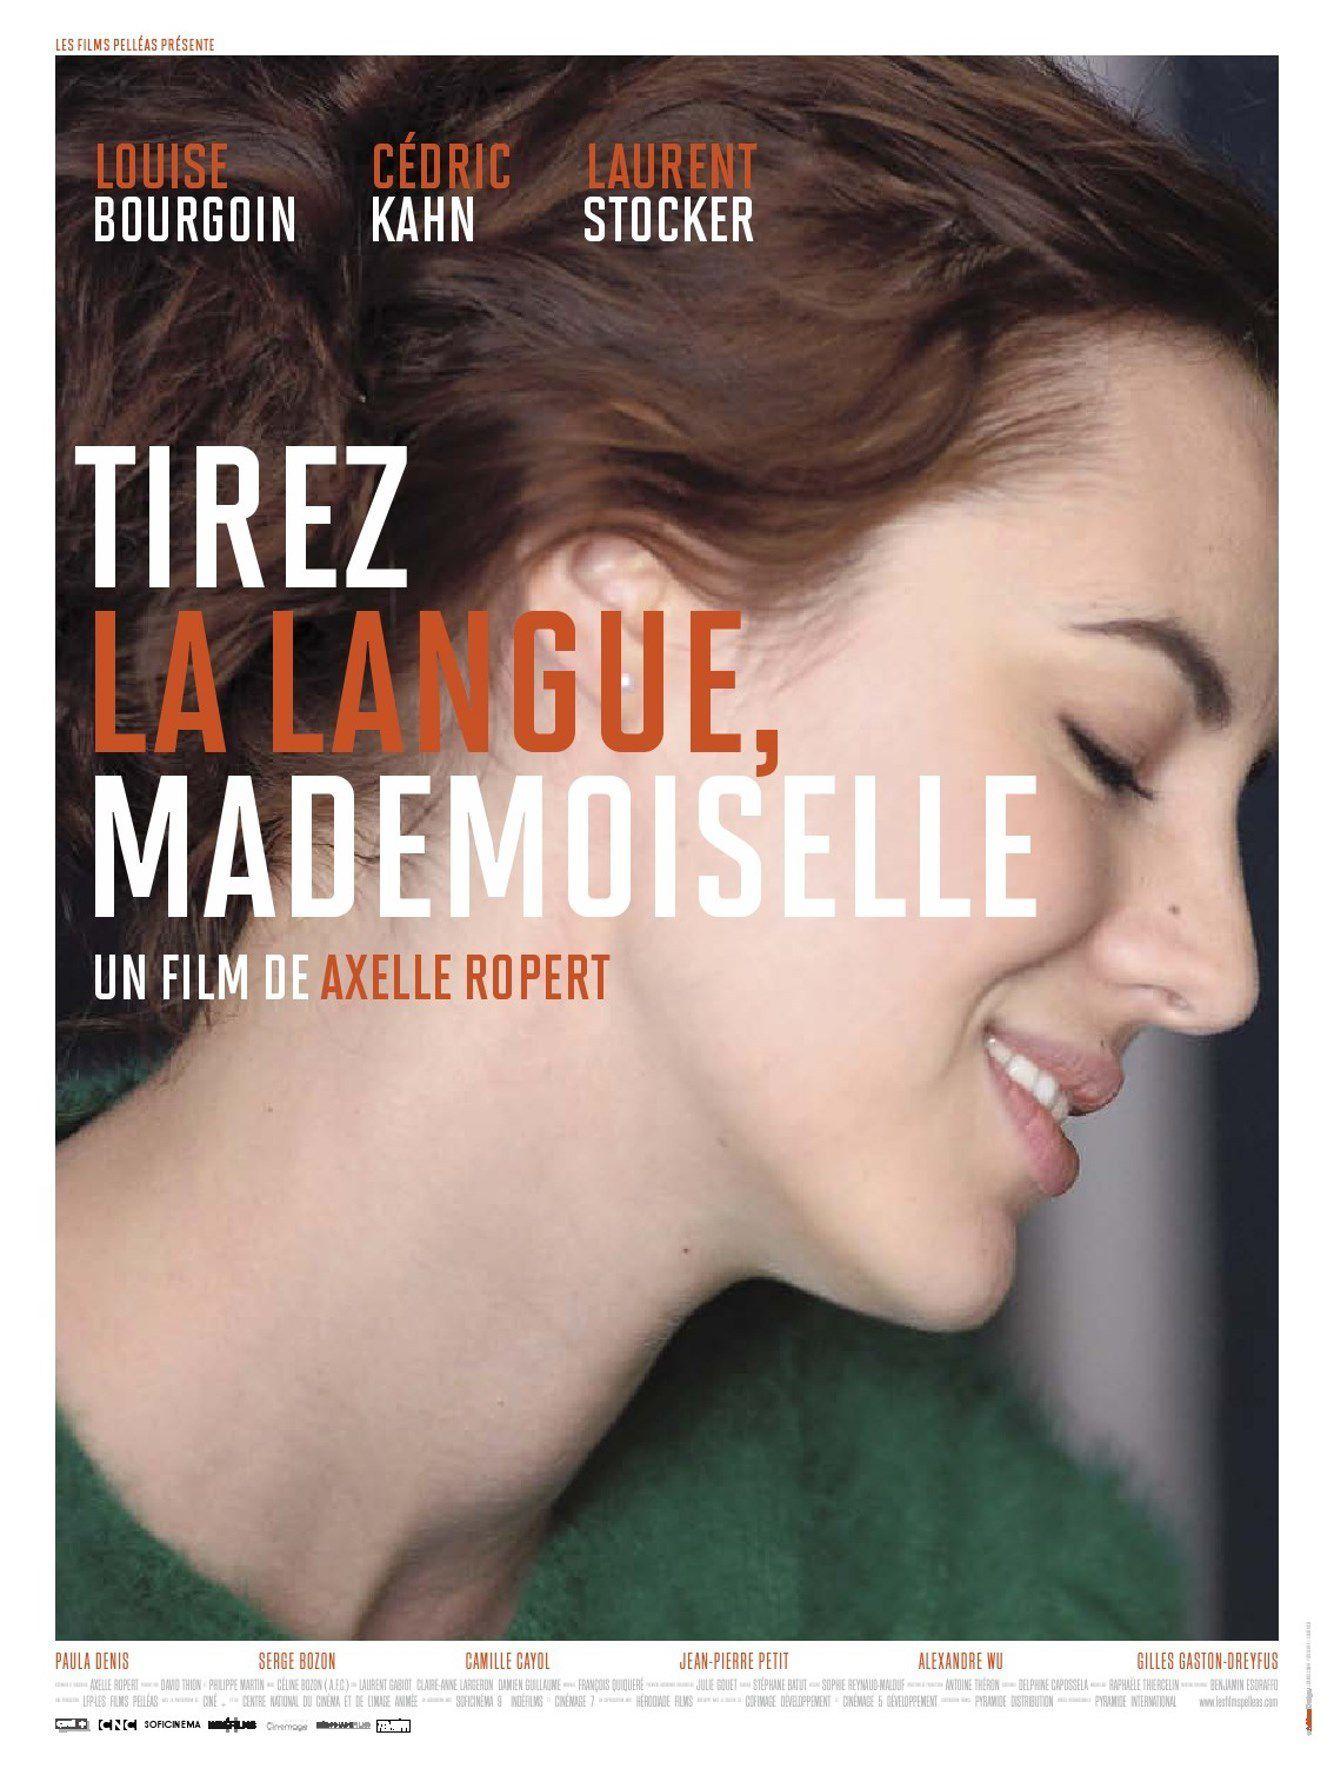 Tirez la langue, mademoiselle - Film (2013)